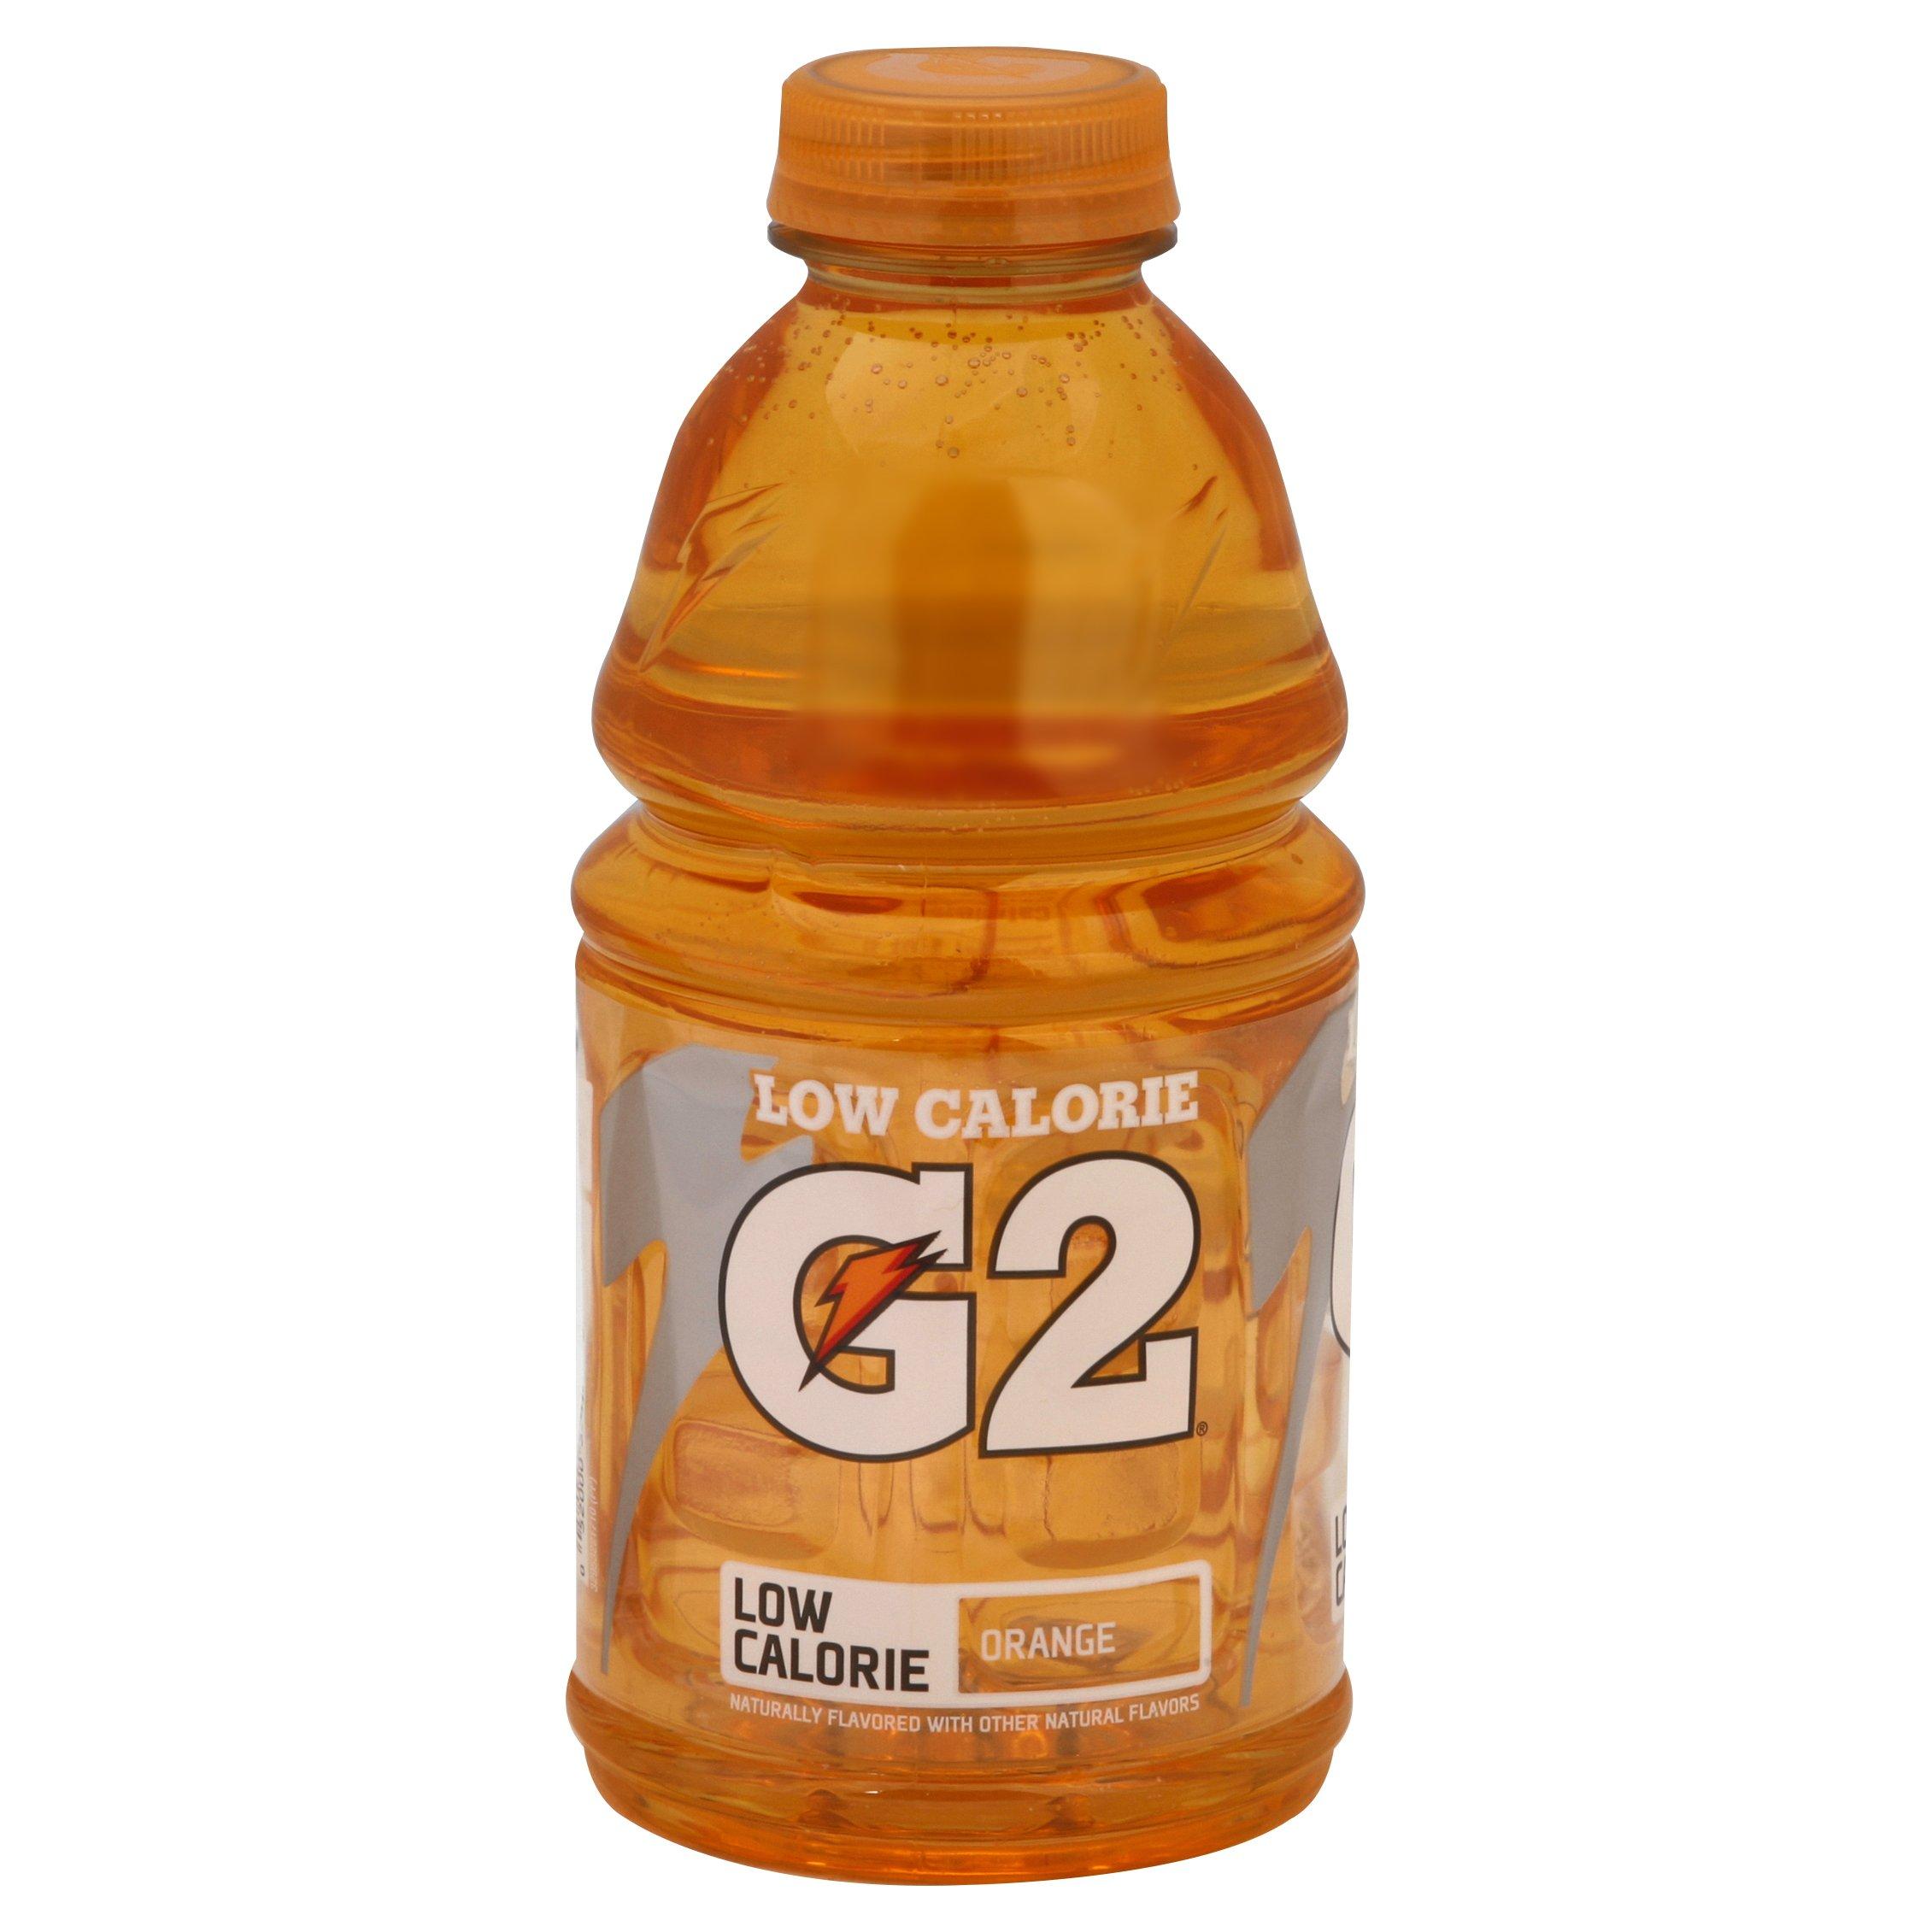 Gatorade Orange Low Calorie Sports Drink 32OZ 12-Pack